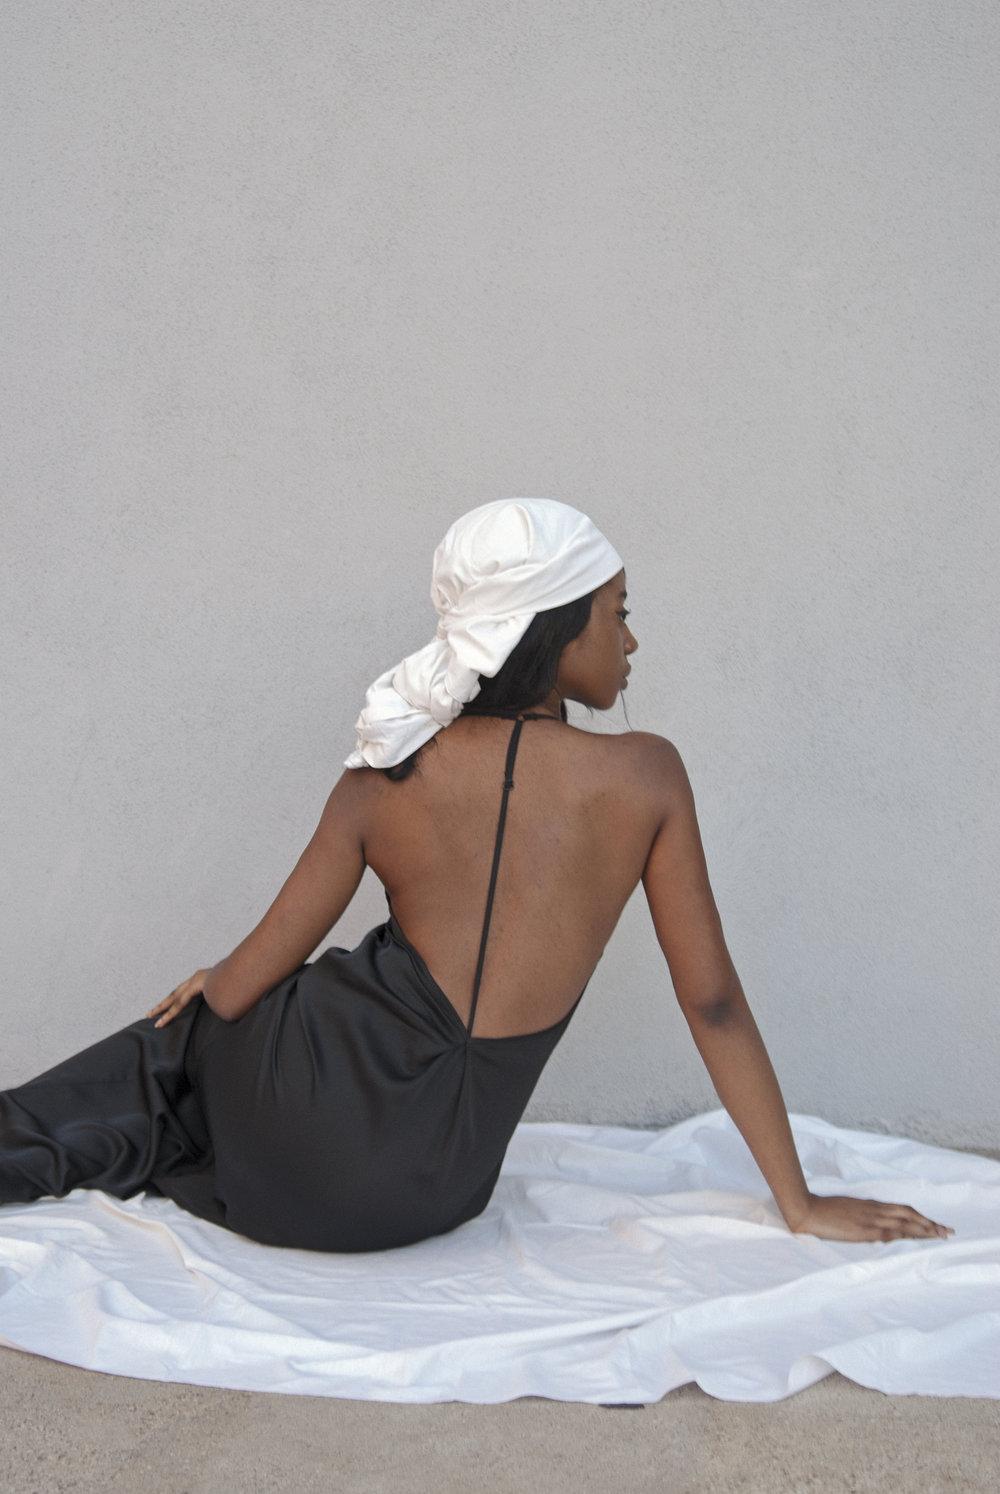 km-by-lange-open-back-slik-black-asymmetric-slip-dress-0002.jpg